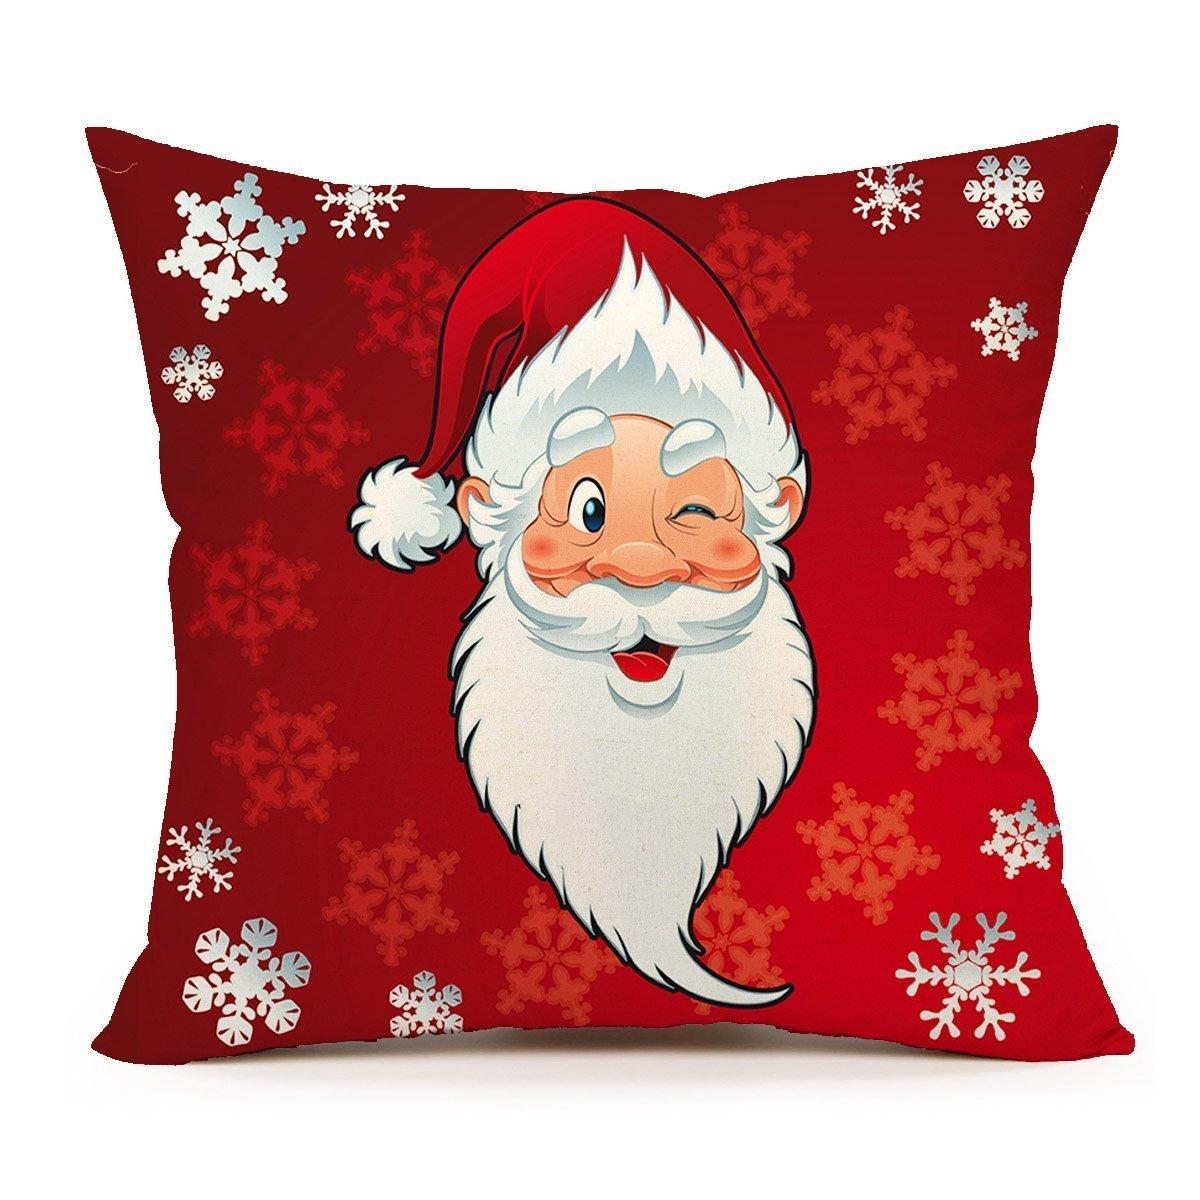 spxubzレッドサンタクロースクリスマス( Smile )枕カバー装飾ホーム装飾素敵なギフトスクエアインドア/アウトドア枕カバーサイズ: 18 x 18インチ(両面) 16x16 Inch B07CGLQZLM